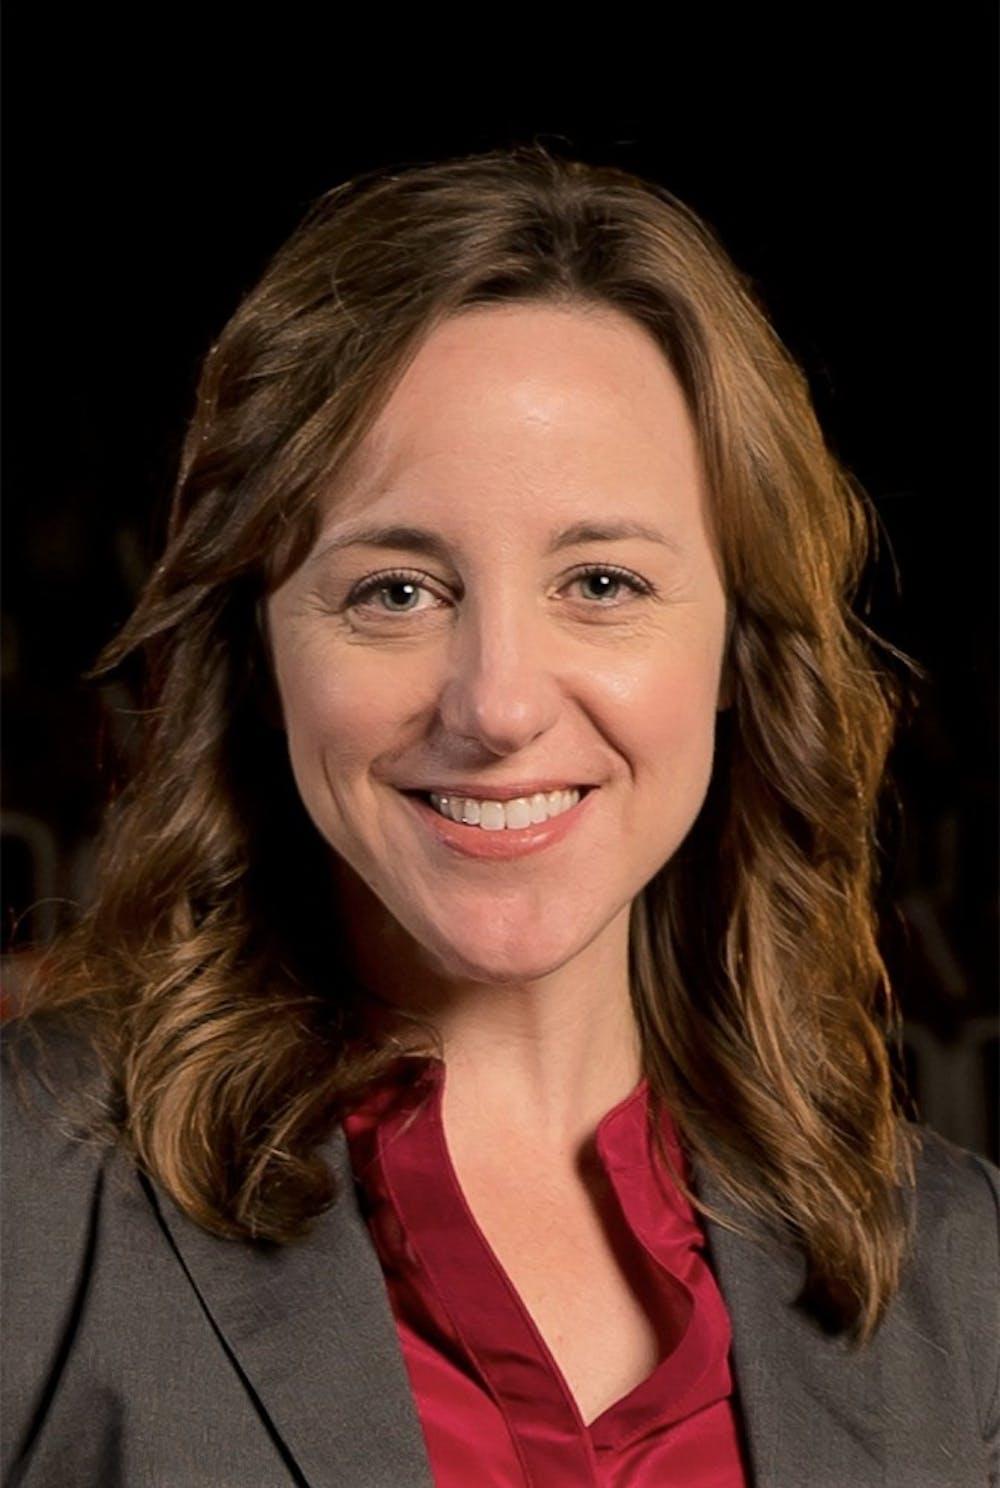 Julie Cromer named Ohio's next athletic director